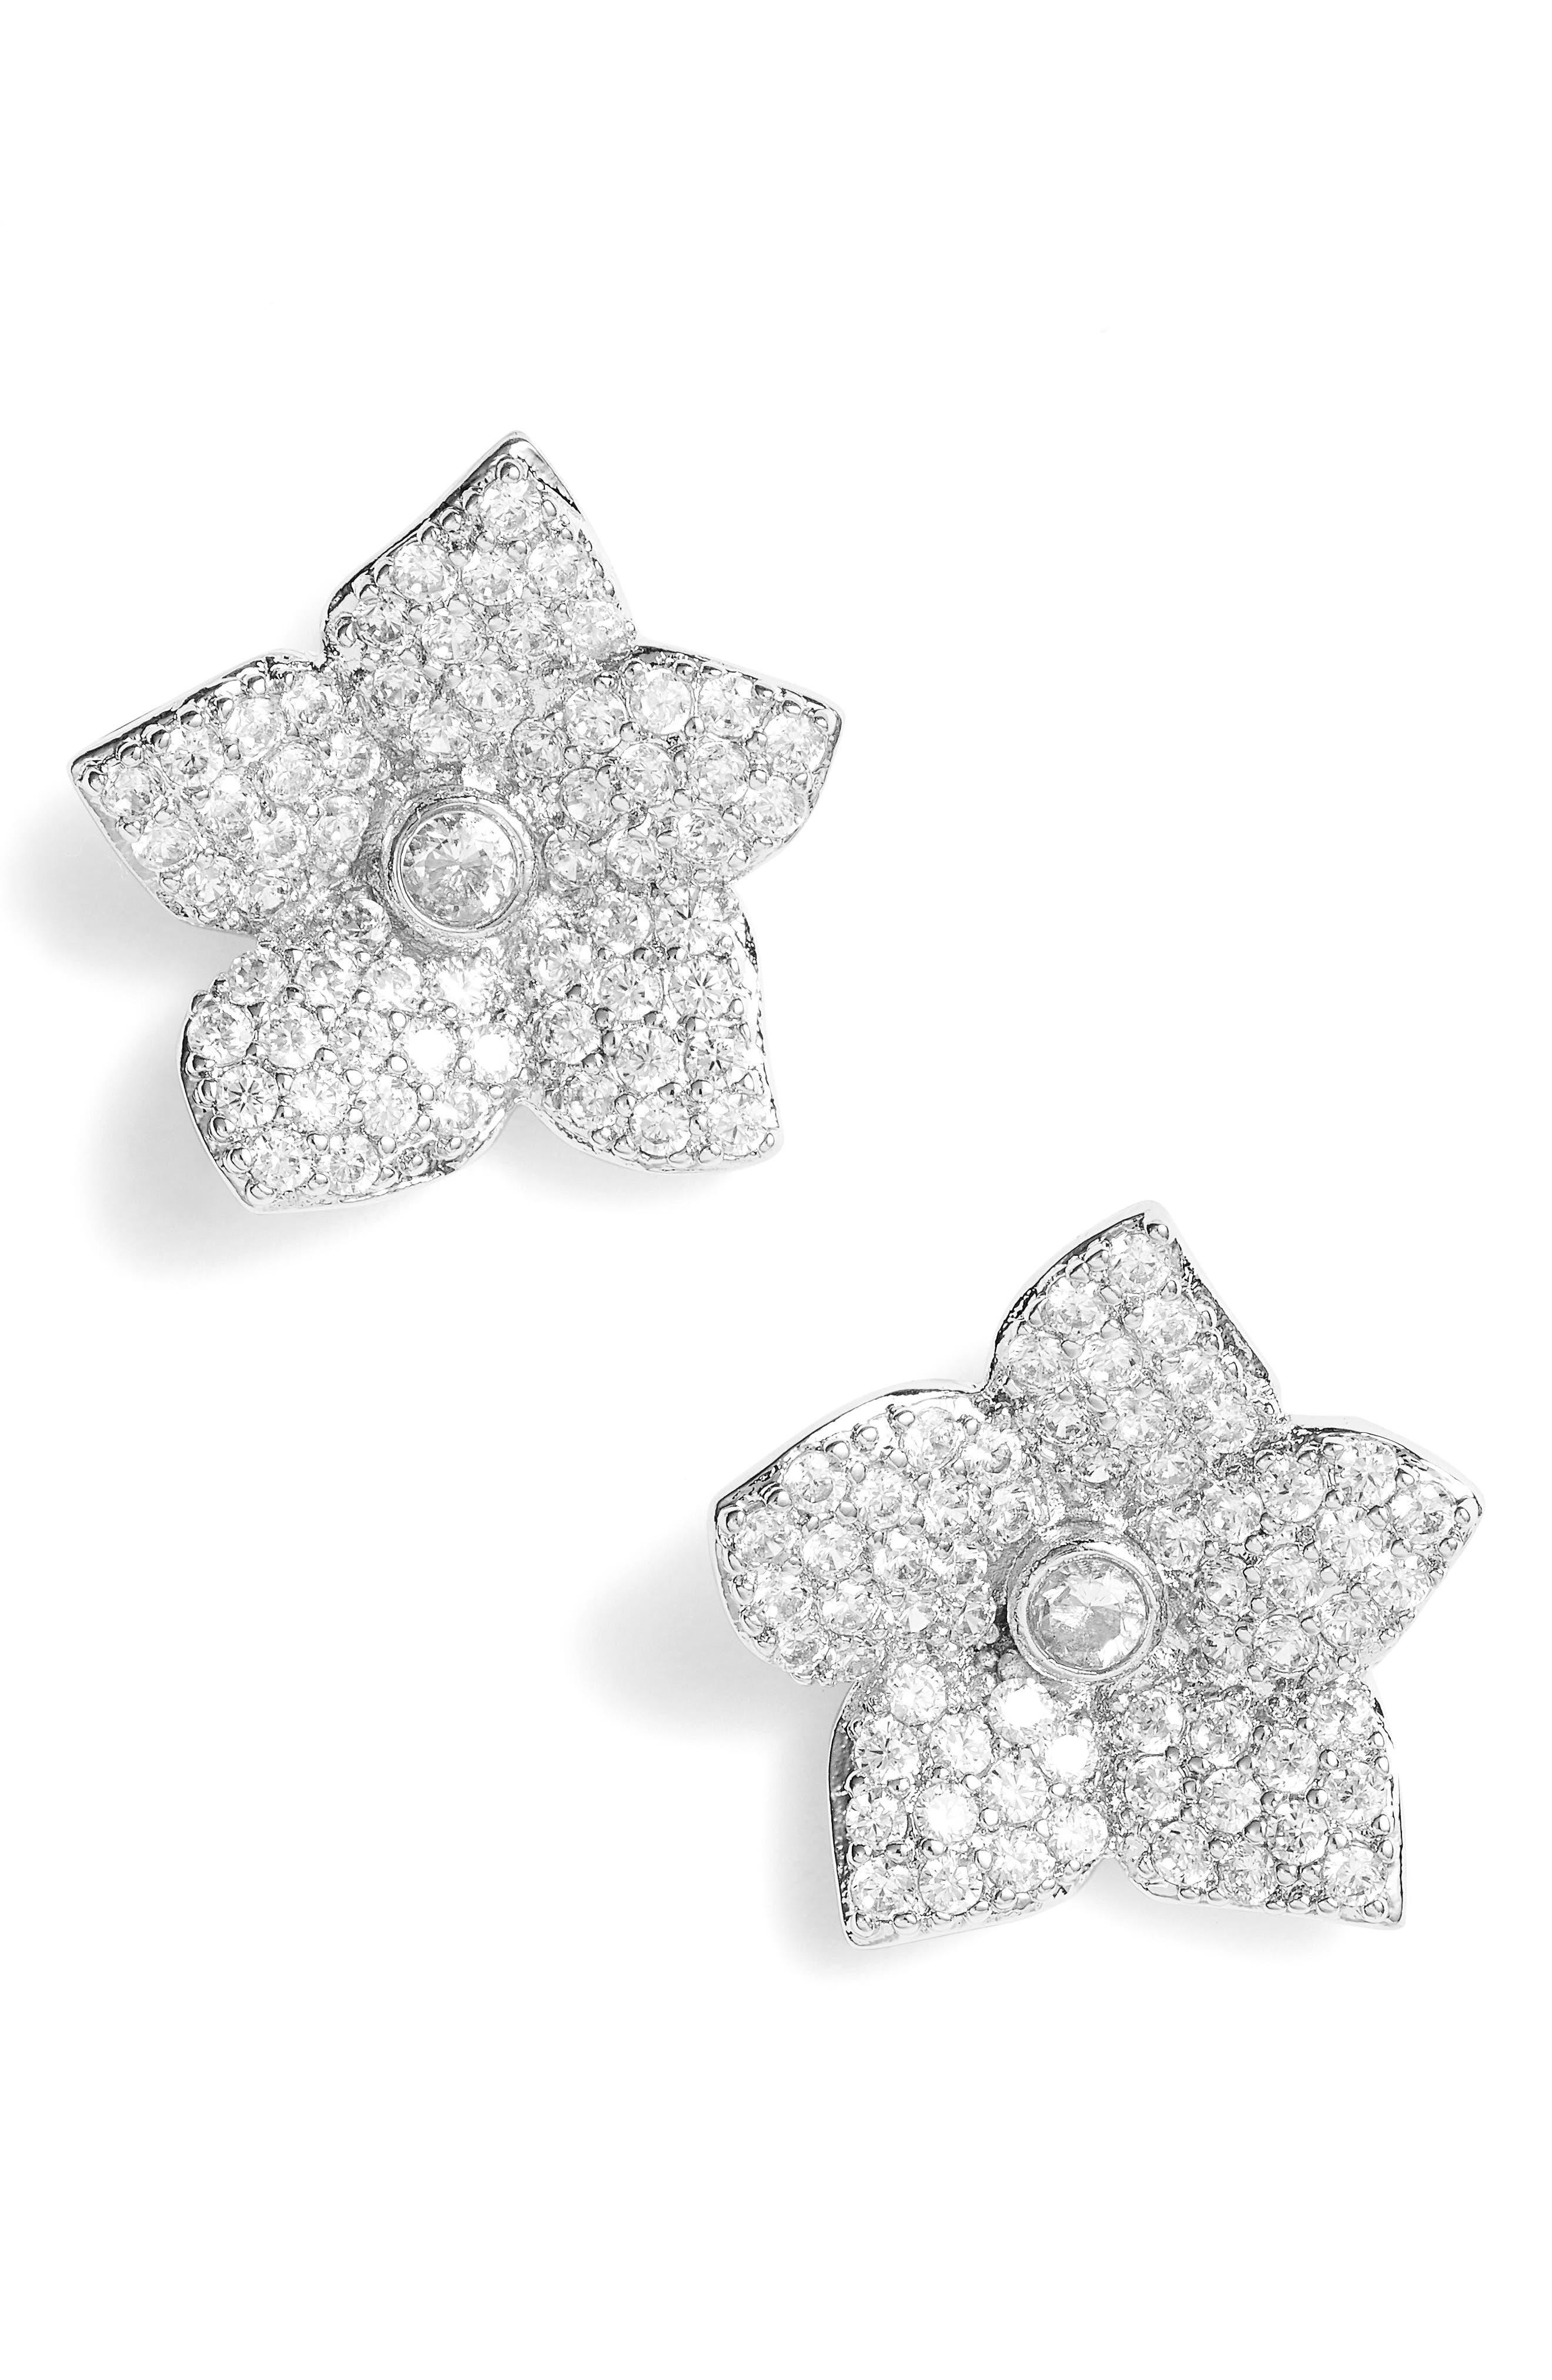 Kate Spade Blooming Pavé Stud Earrings,                             Main thumbnail 1, color,                             041